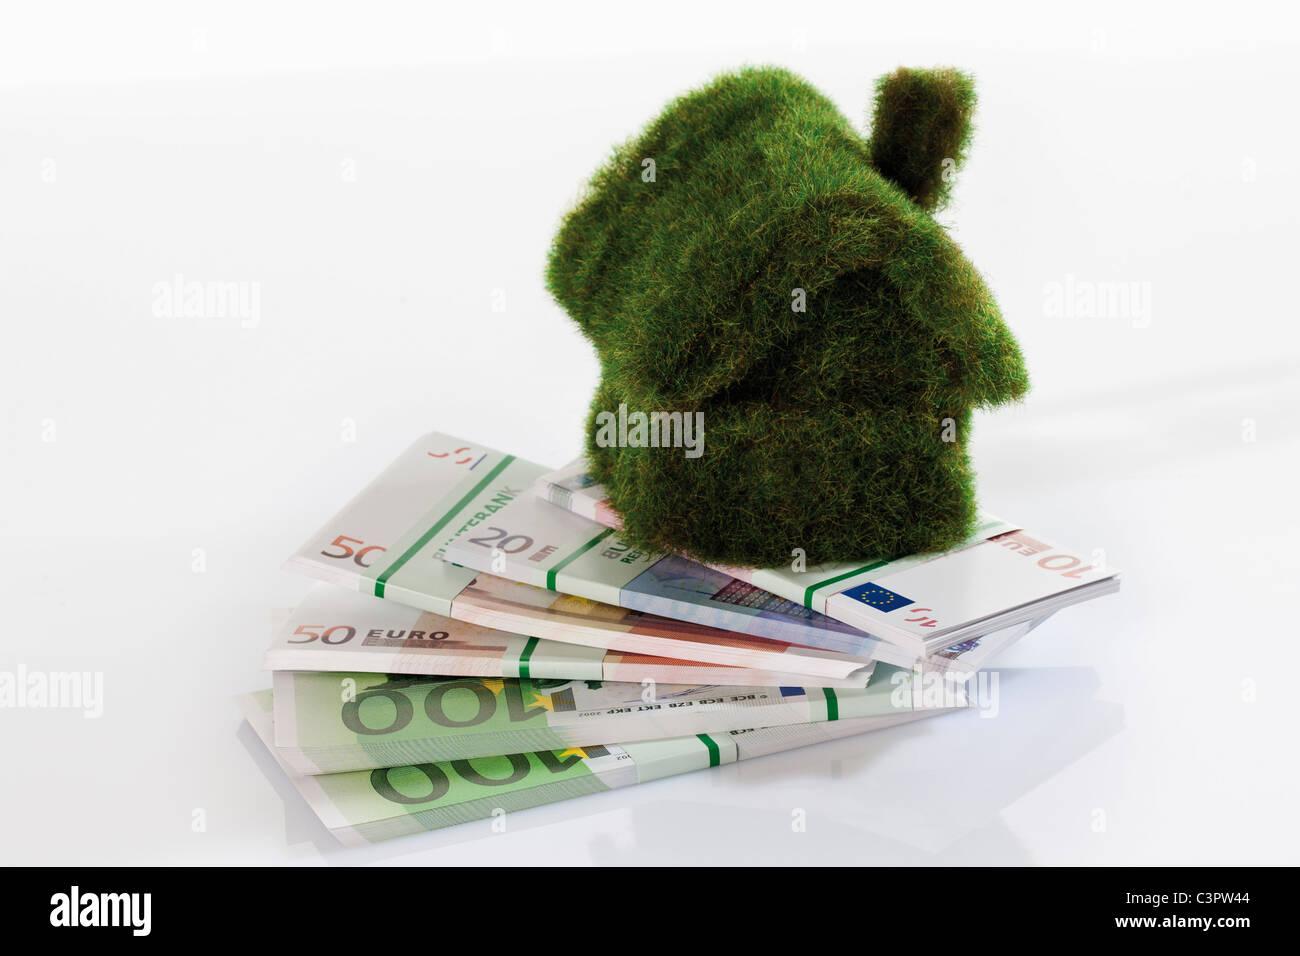 Eco-house on bundles of euro notes, close up - Stock Image